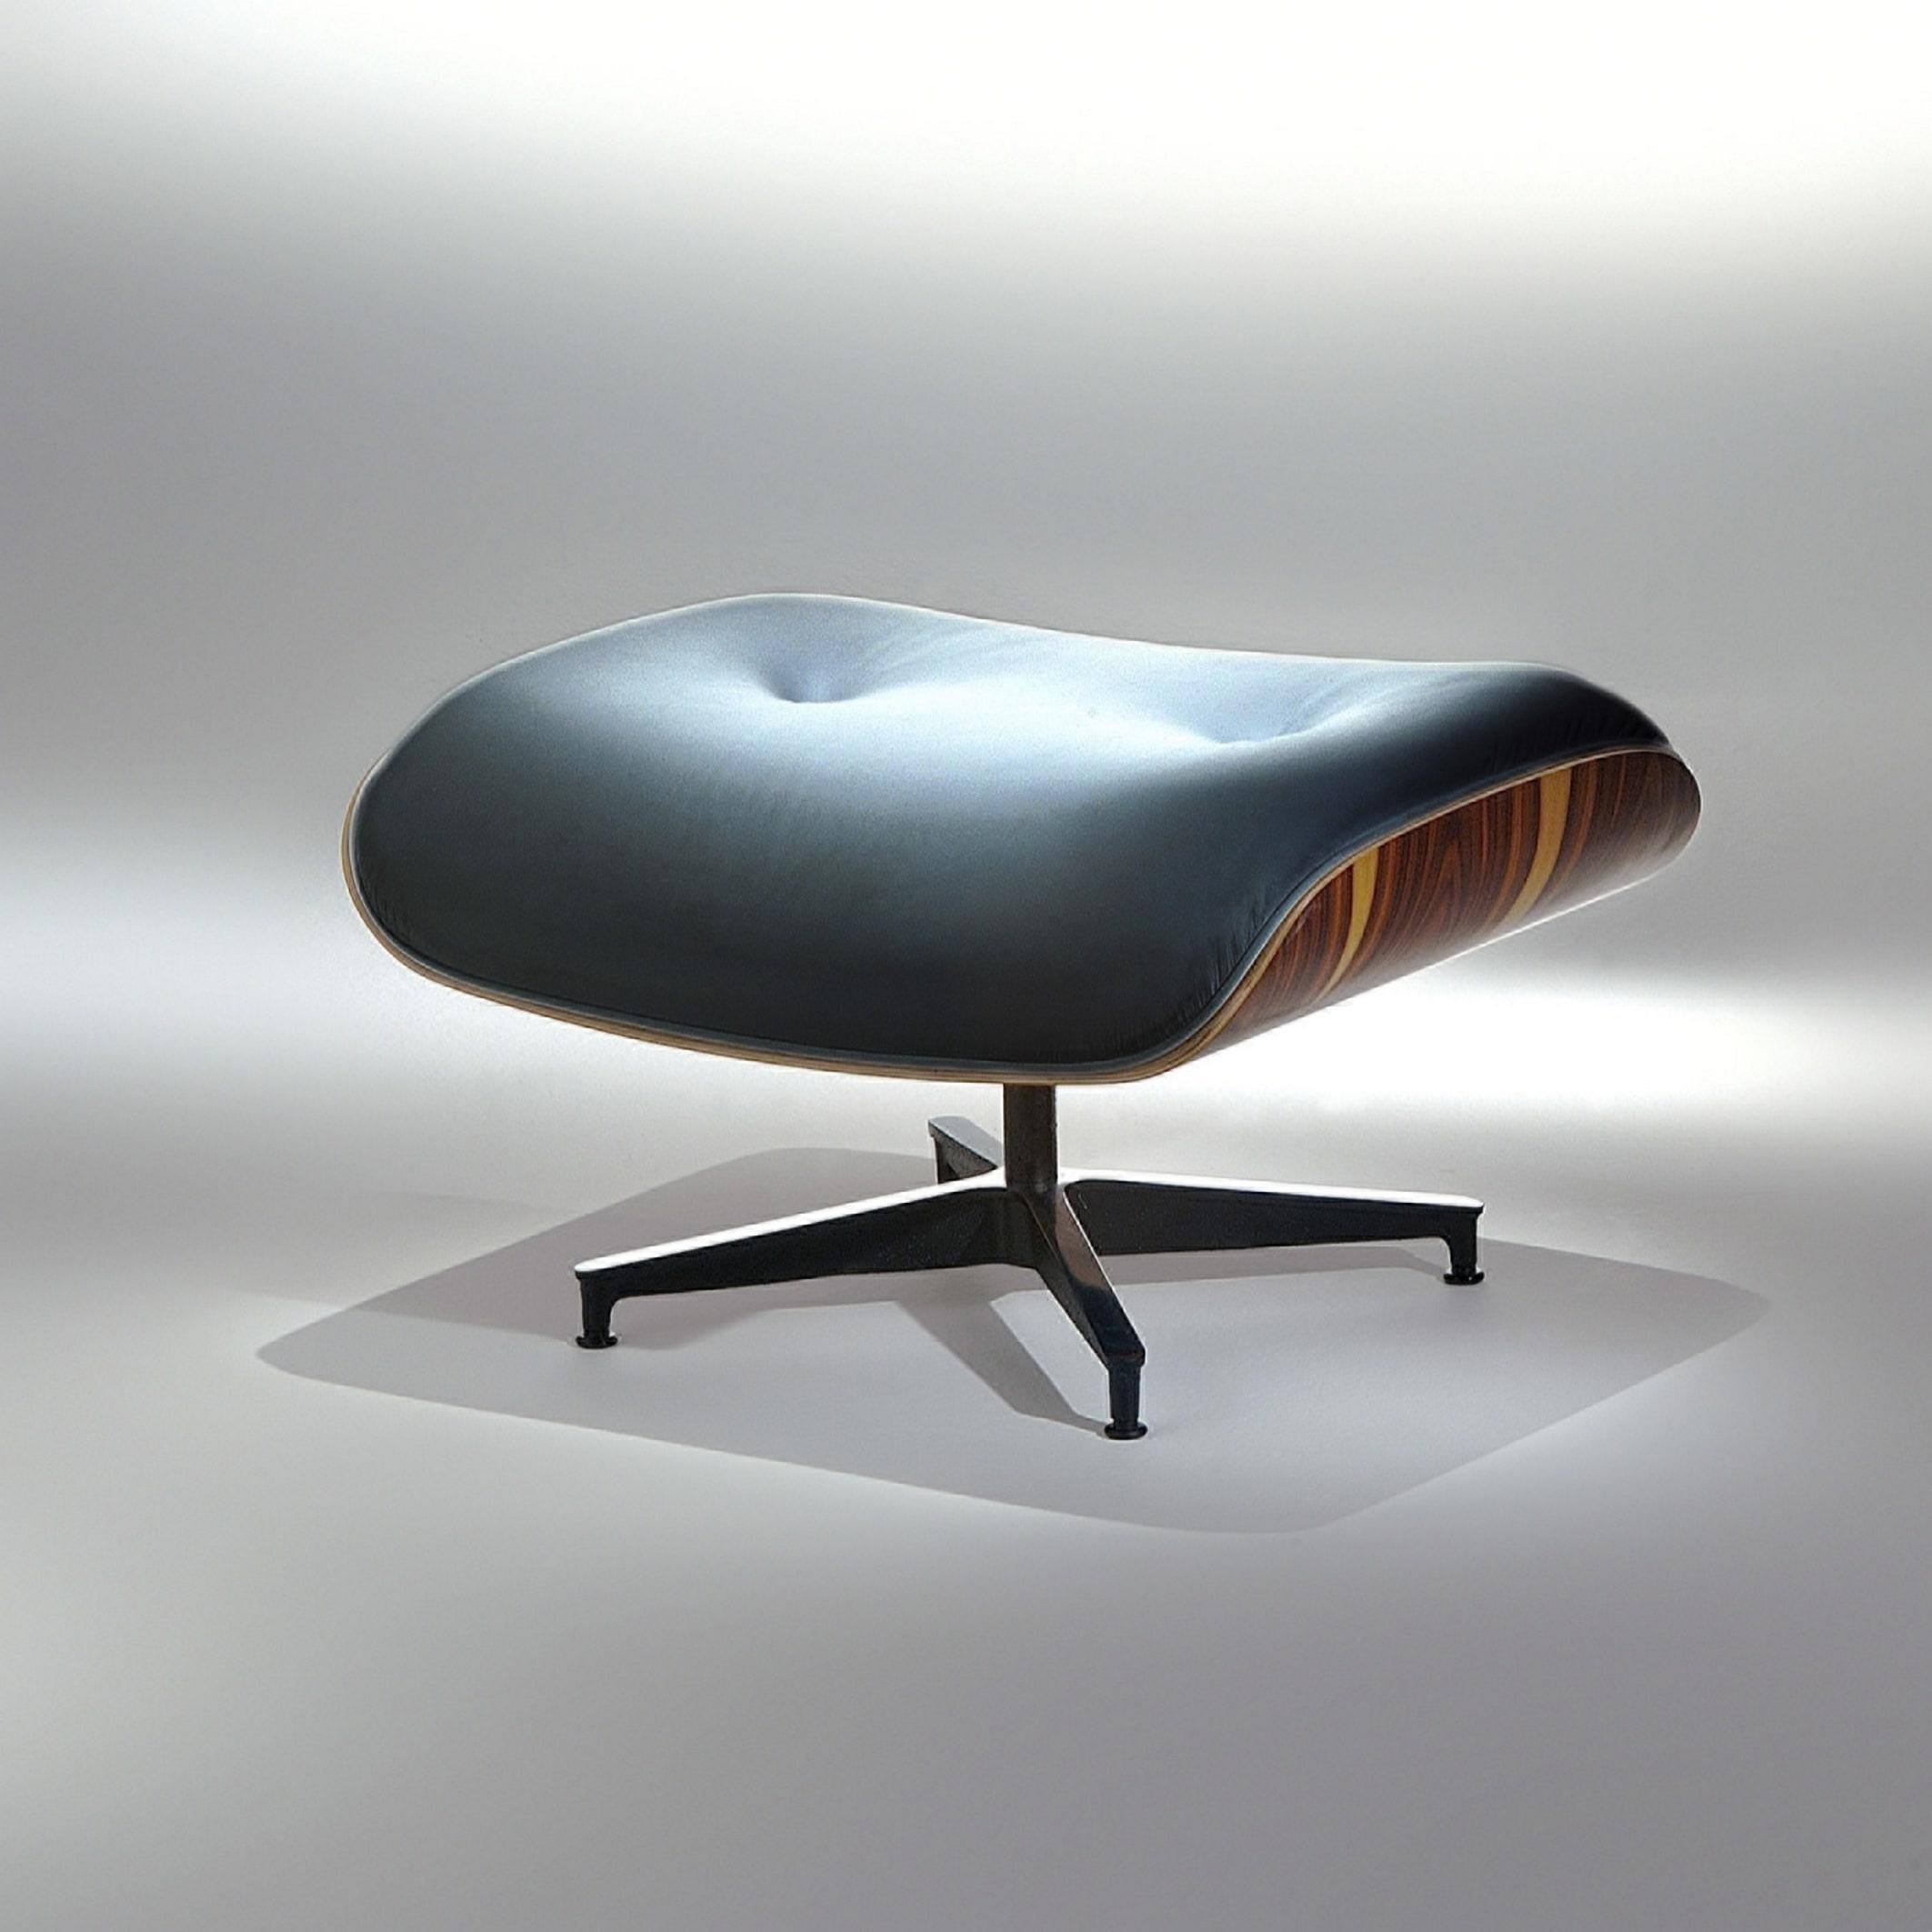 Banqueta Charles Eames Base Alumínio Polido Pintura Preta Studio Mais Design by Charles e Ray Eames